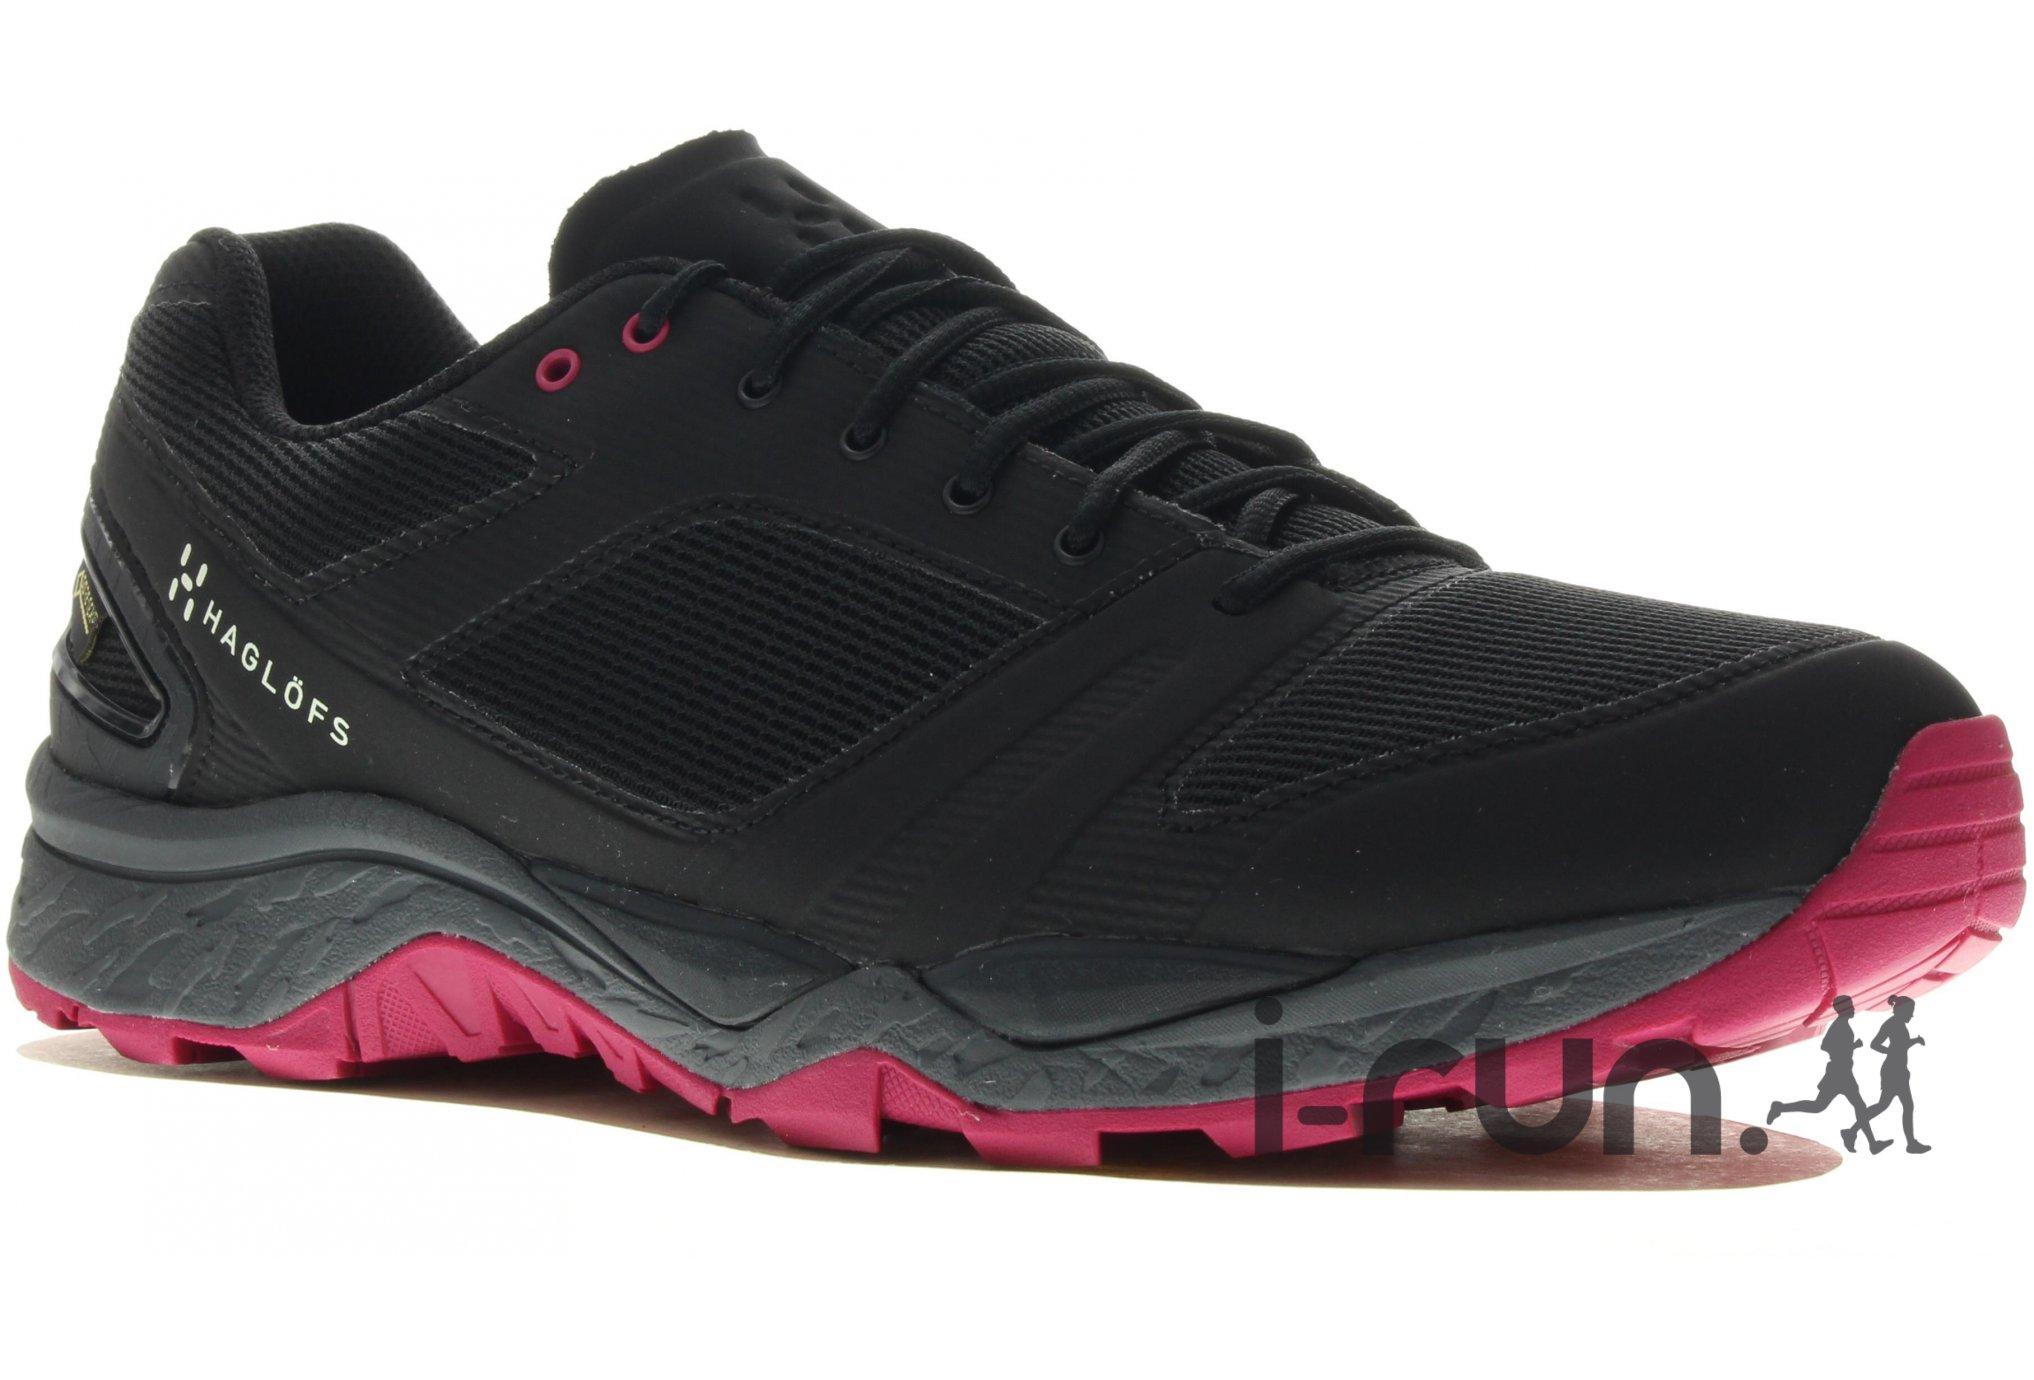 Haglöfs Gram gravel gore-Tex w diététique chaussures femme